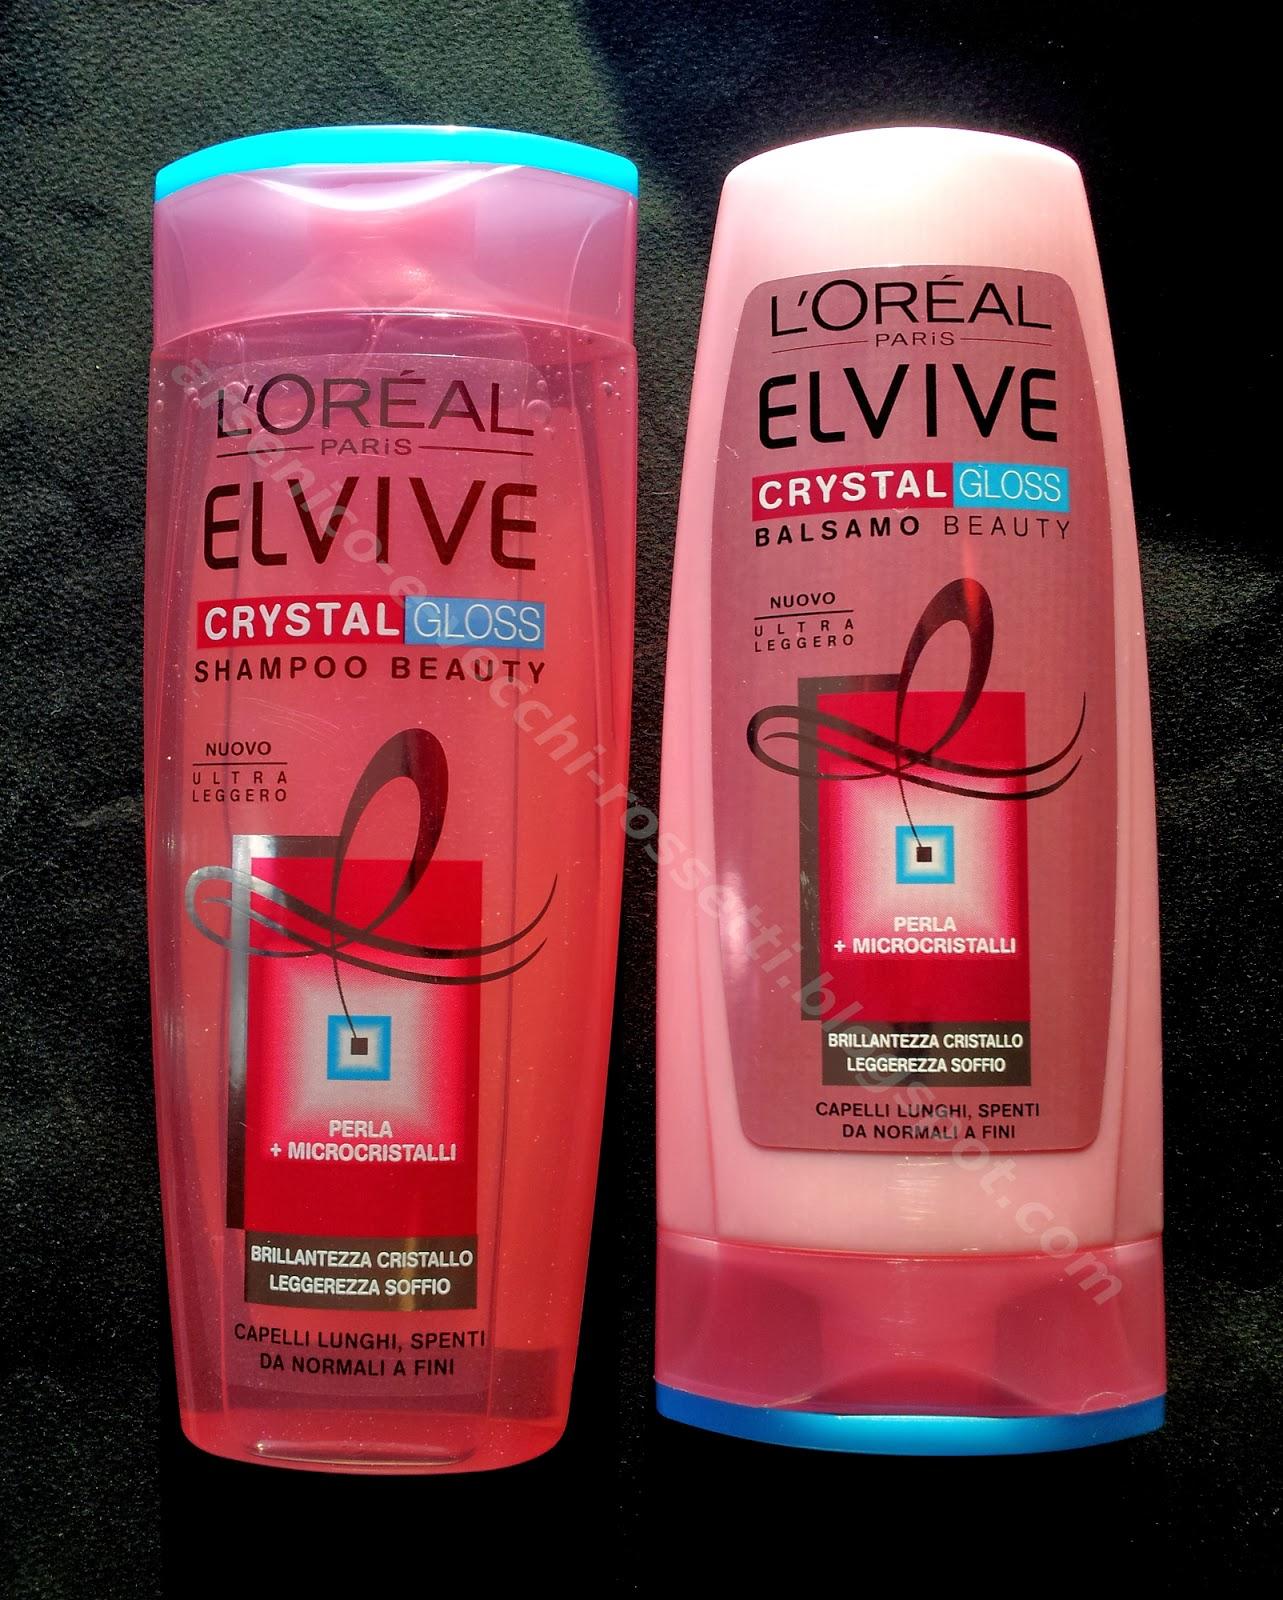 L'Oréal Paris Elvive Crystal Gloss Balsamo Shampoo